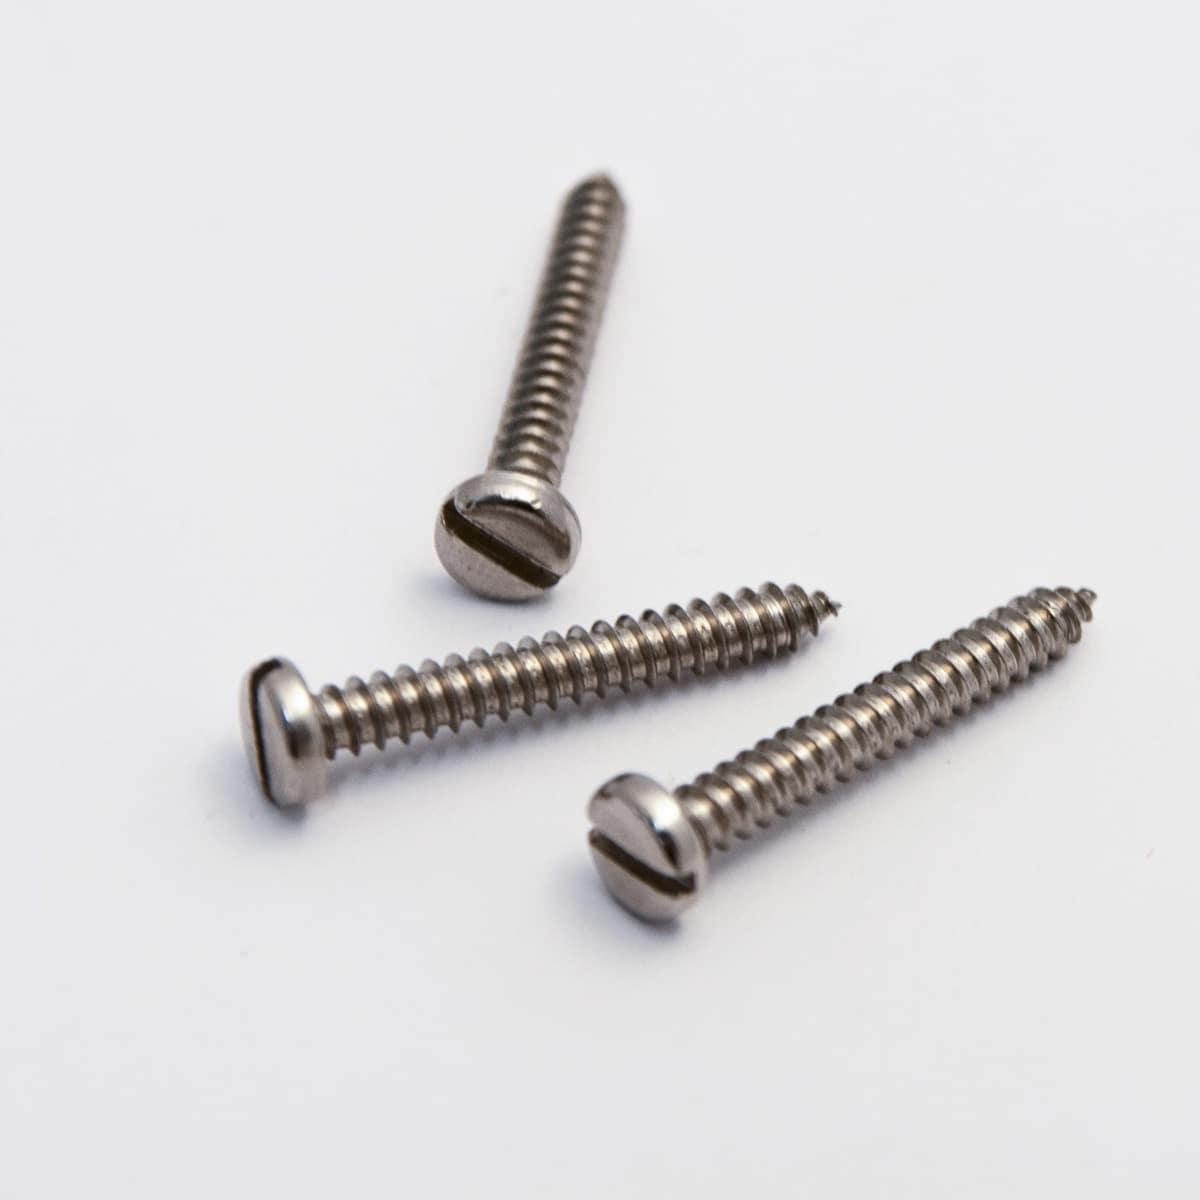 Self-Threading screws